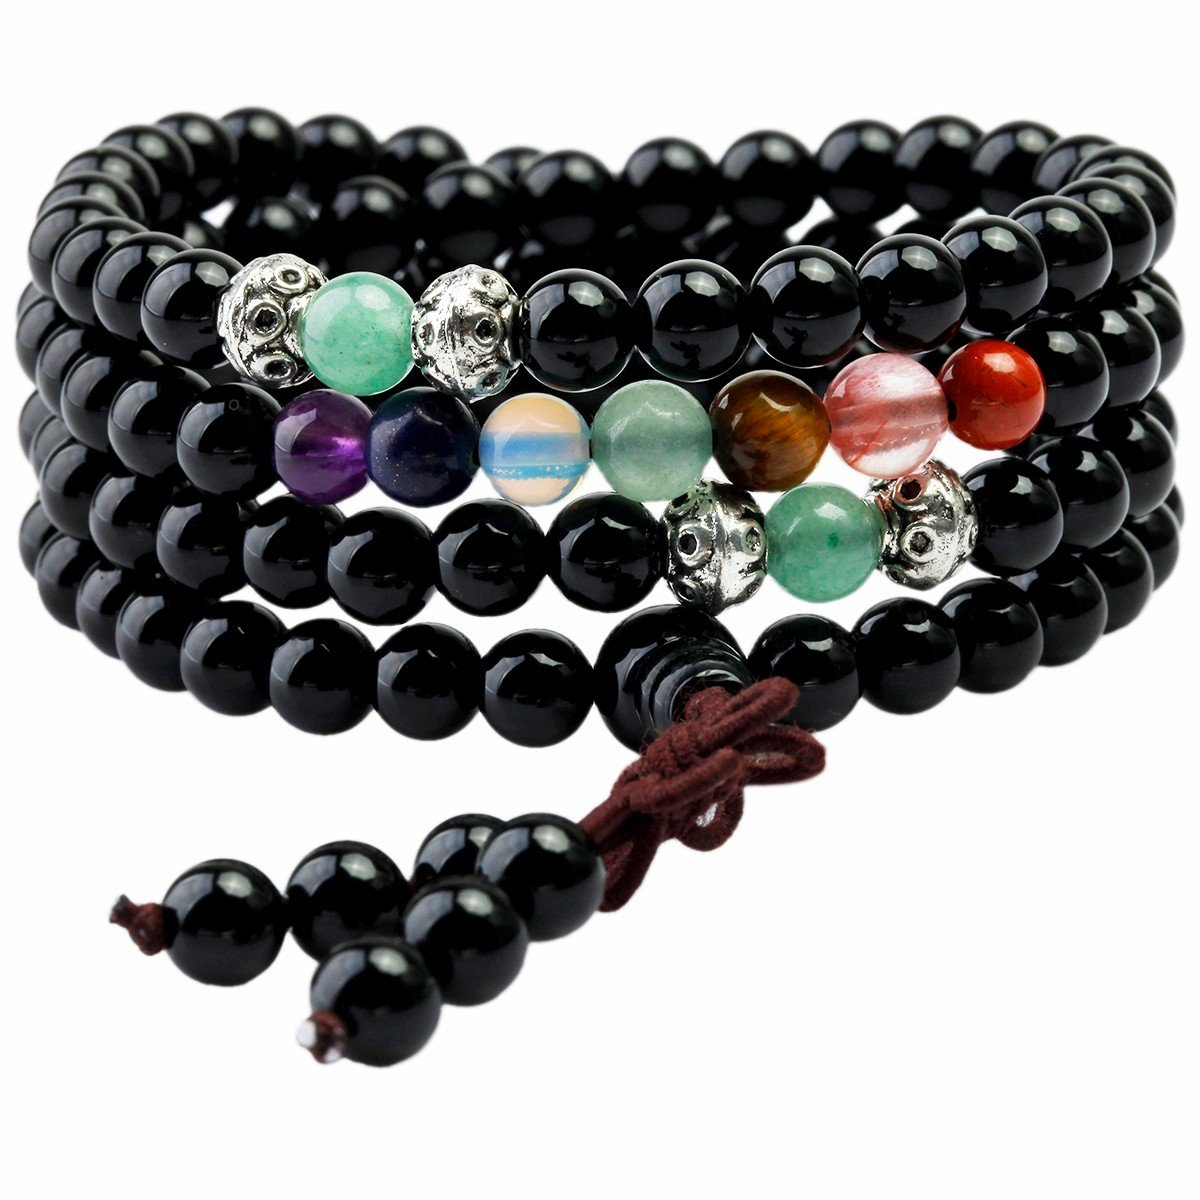 TUMBEELLUWA Beaded Bracelet Multilayer Yoga Meditation Mala Beads with Alloy Charms Lava Rock